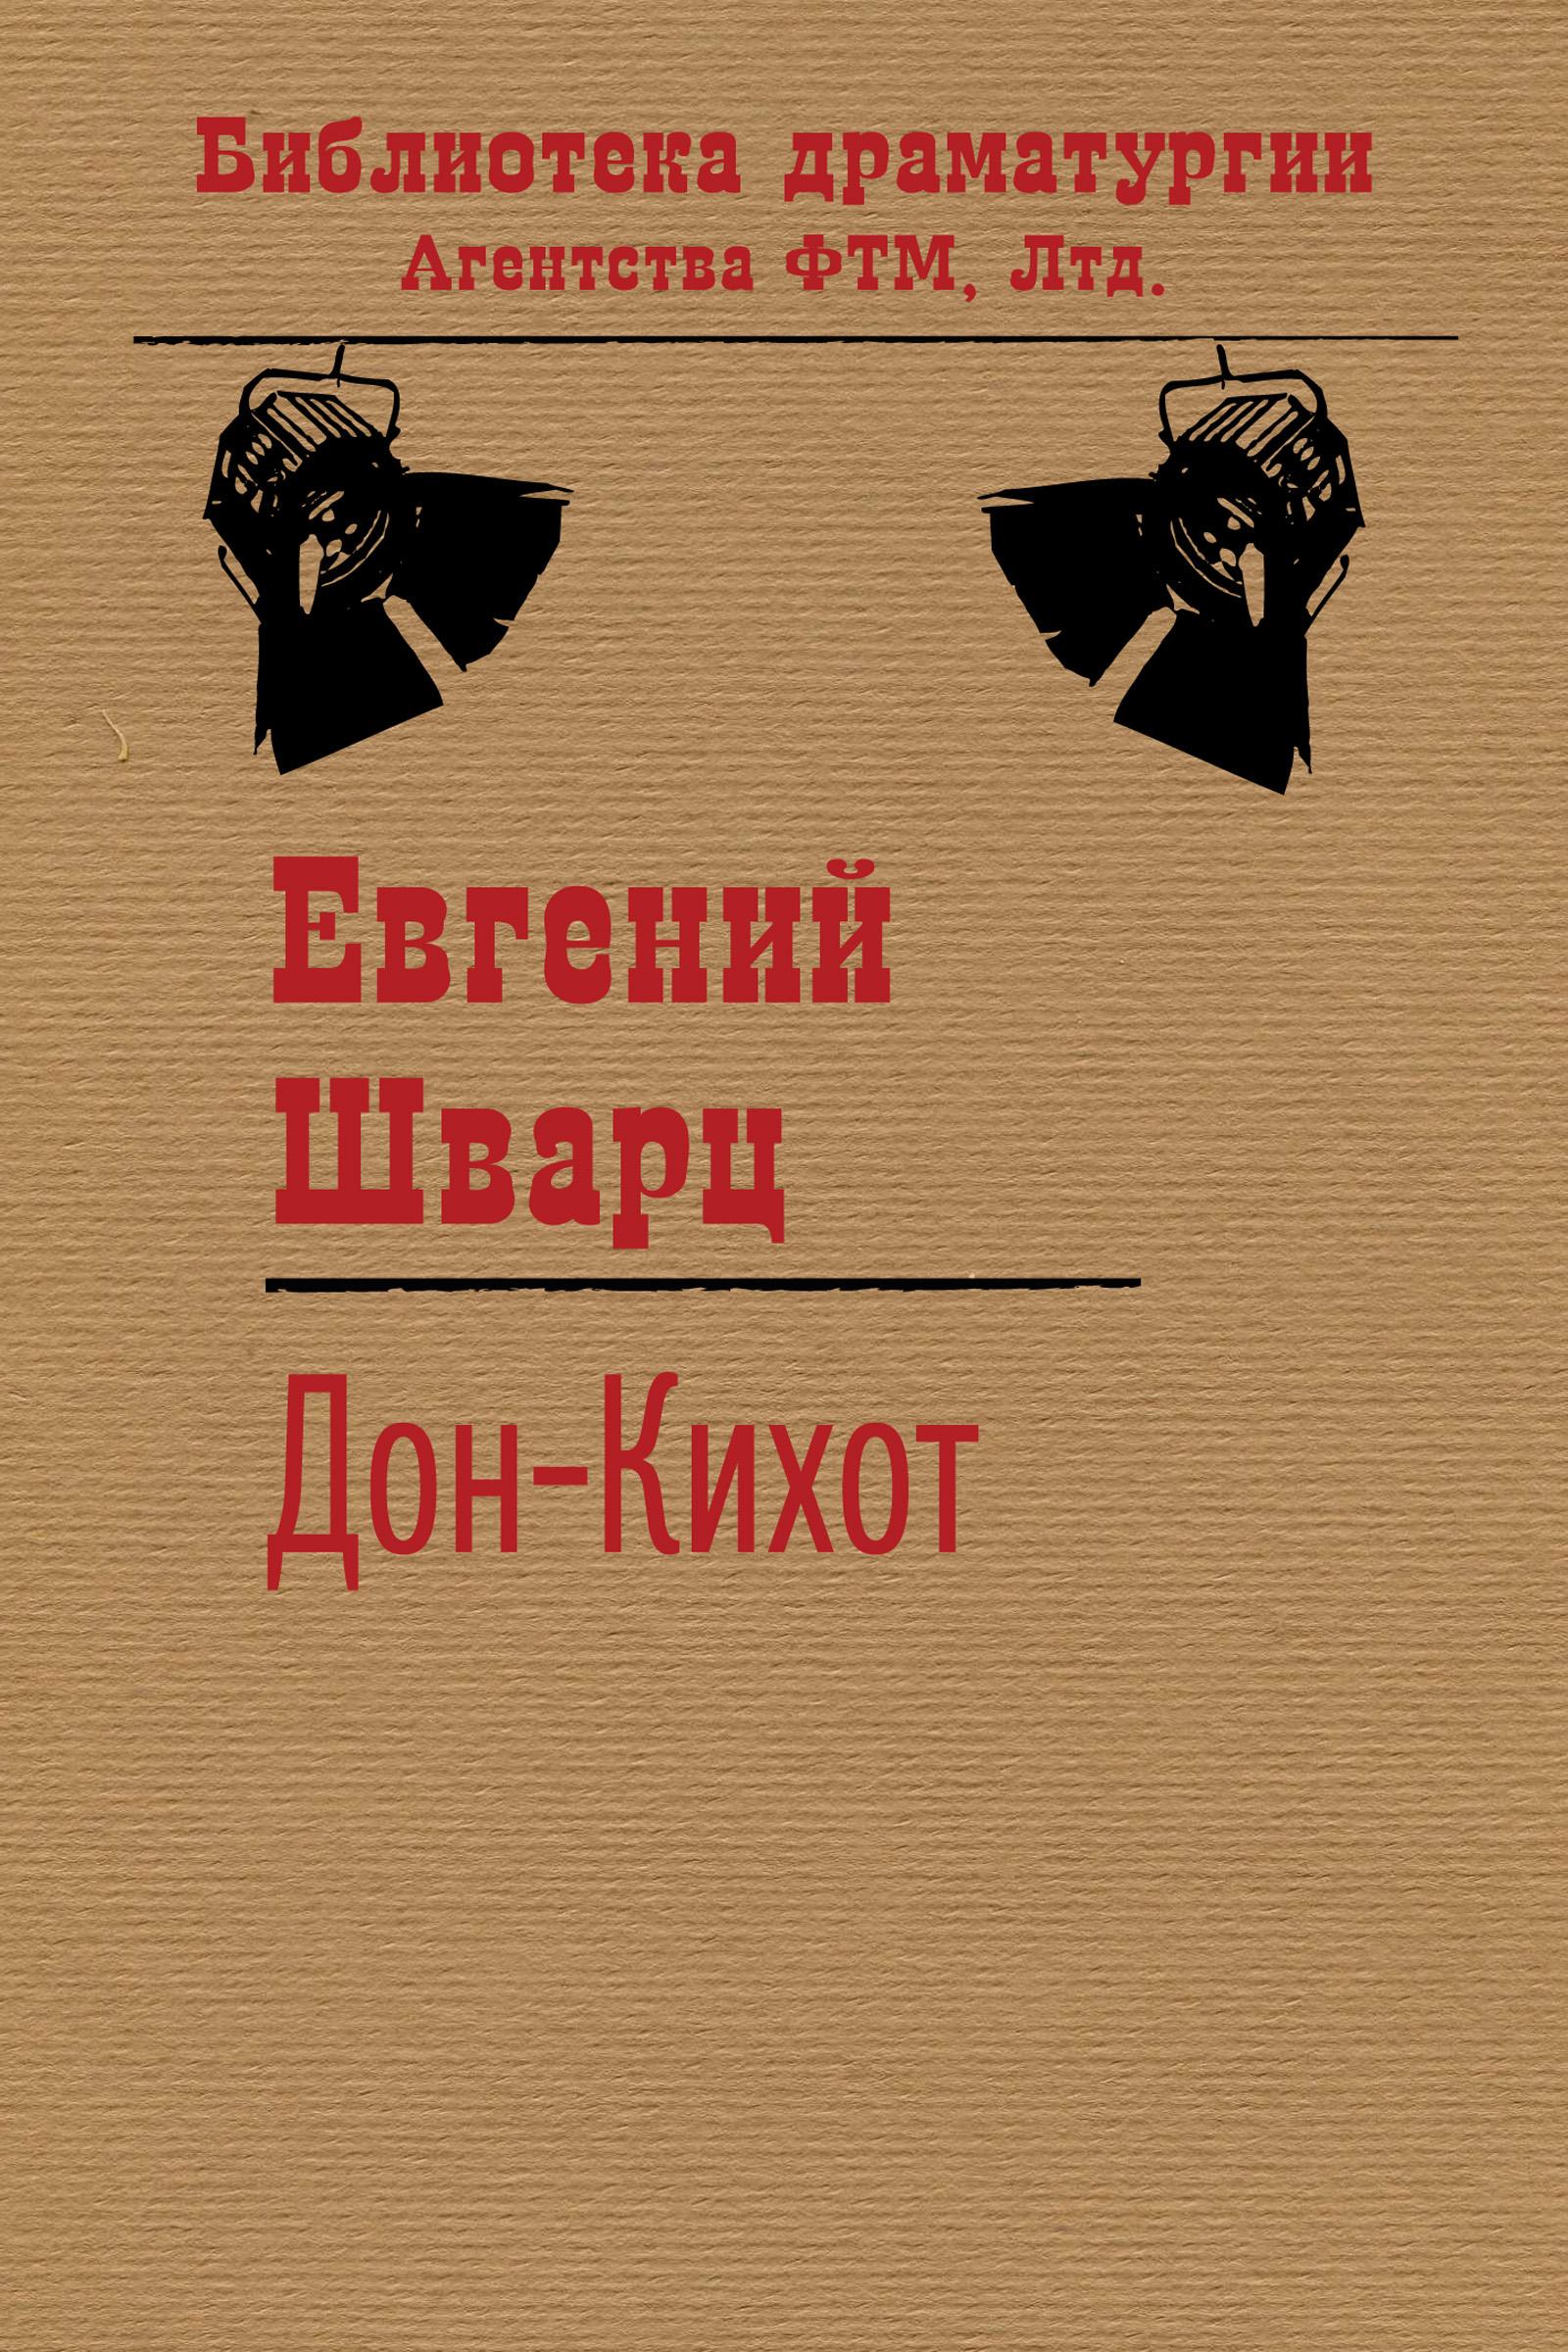 Евгений Шварц Дон-Кихот сервантес м хитроумный идальго дон кихот ламанчский